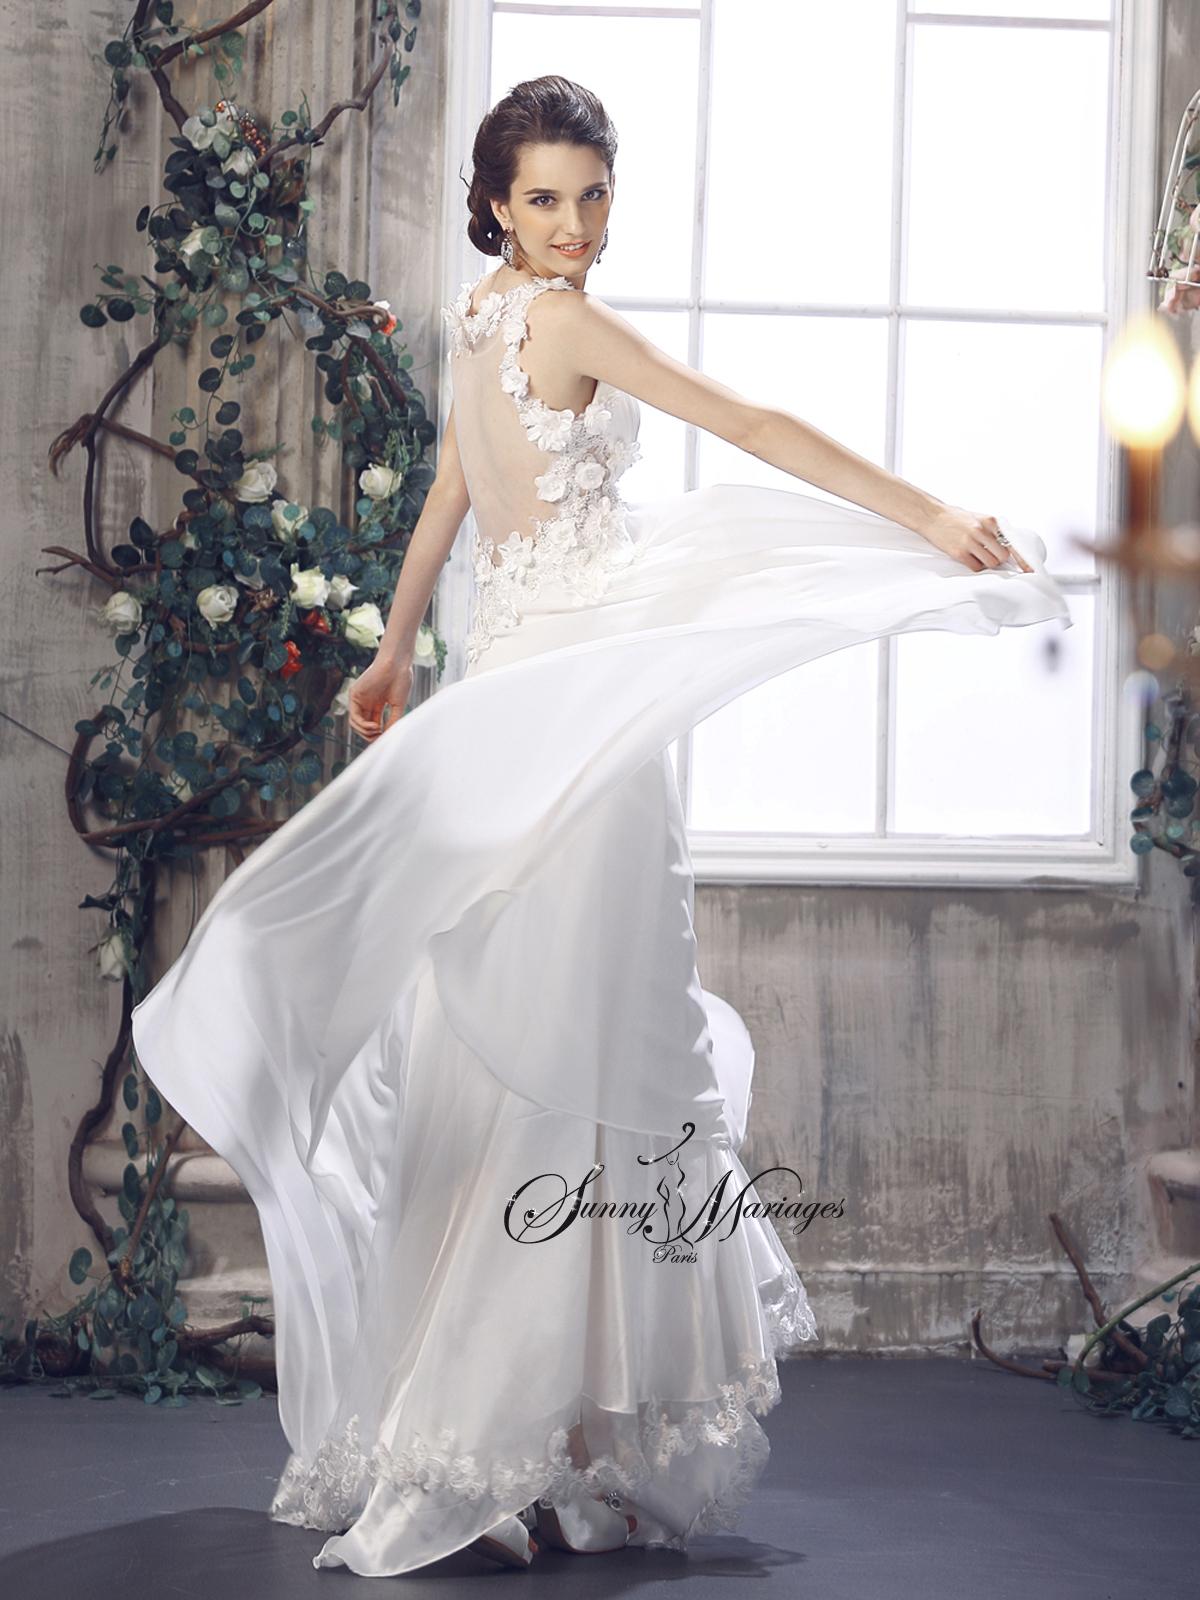 Robe De Mariee Empire Fluide En Mousseline Style Boheme Chic Robe De Mariee Pas Cher Robe De